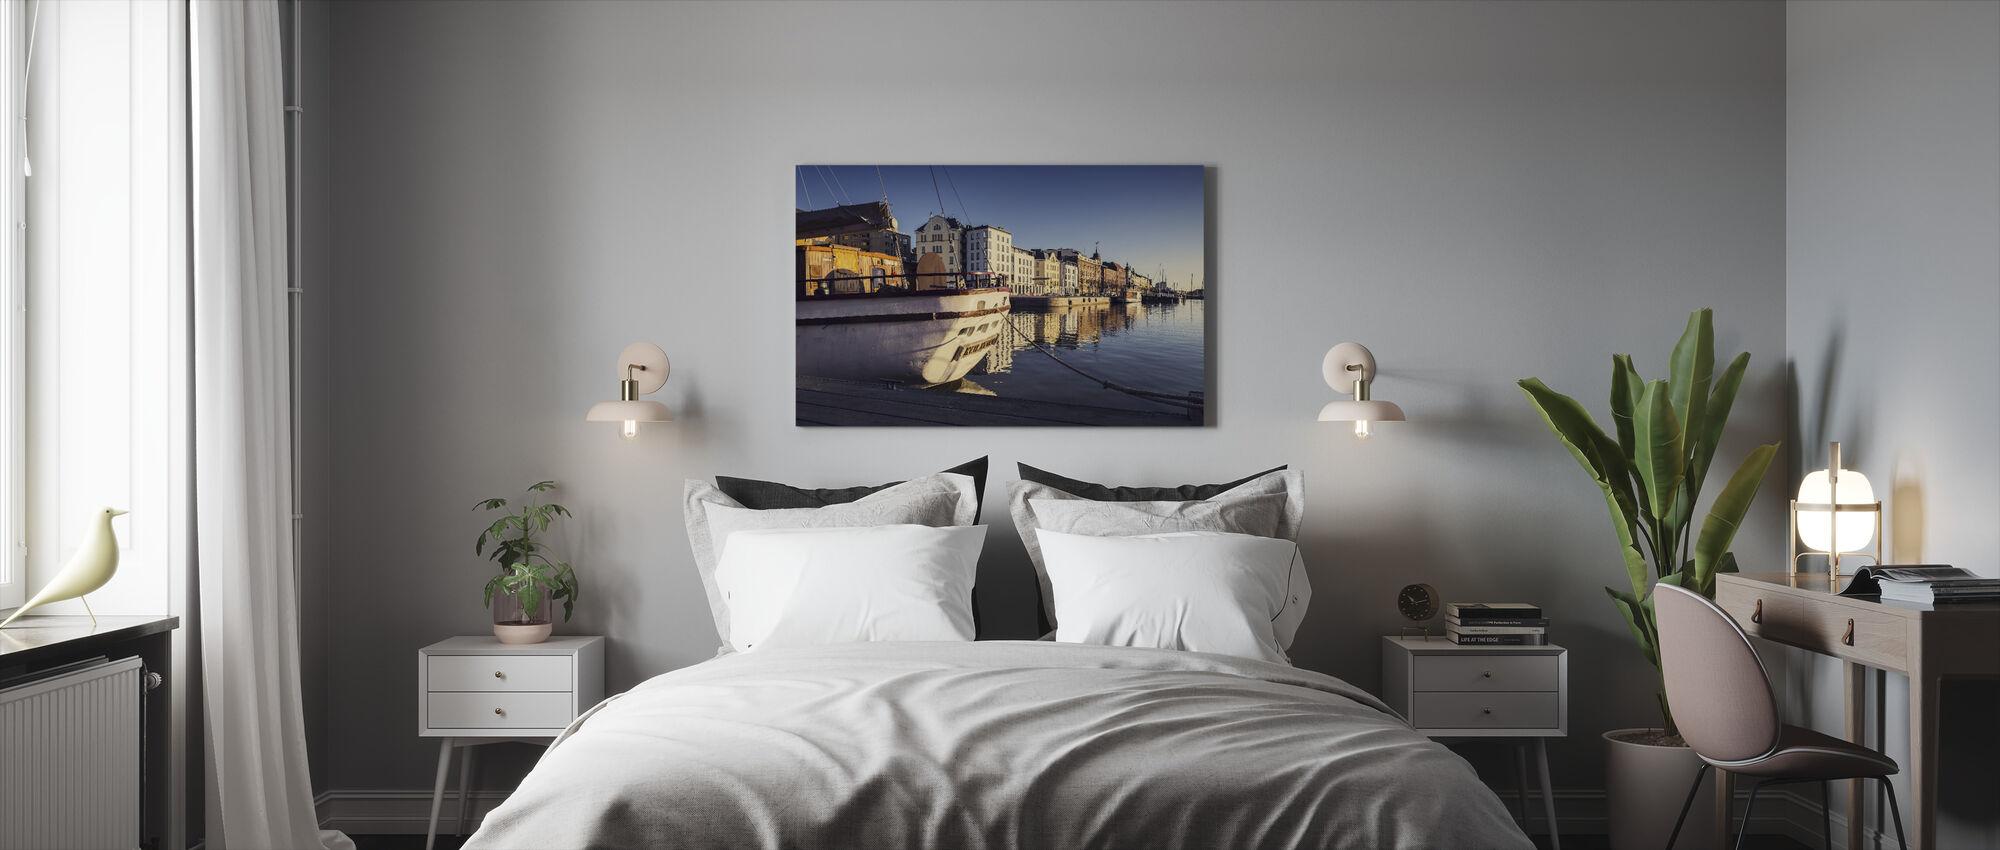 Old Harbor - Canvas print - Bedroom